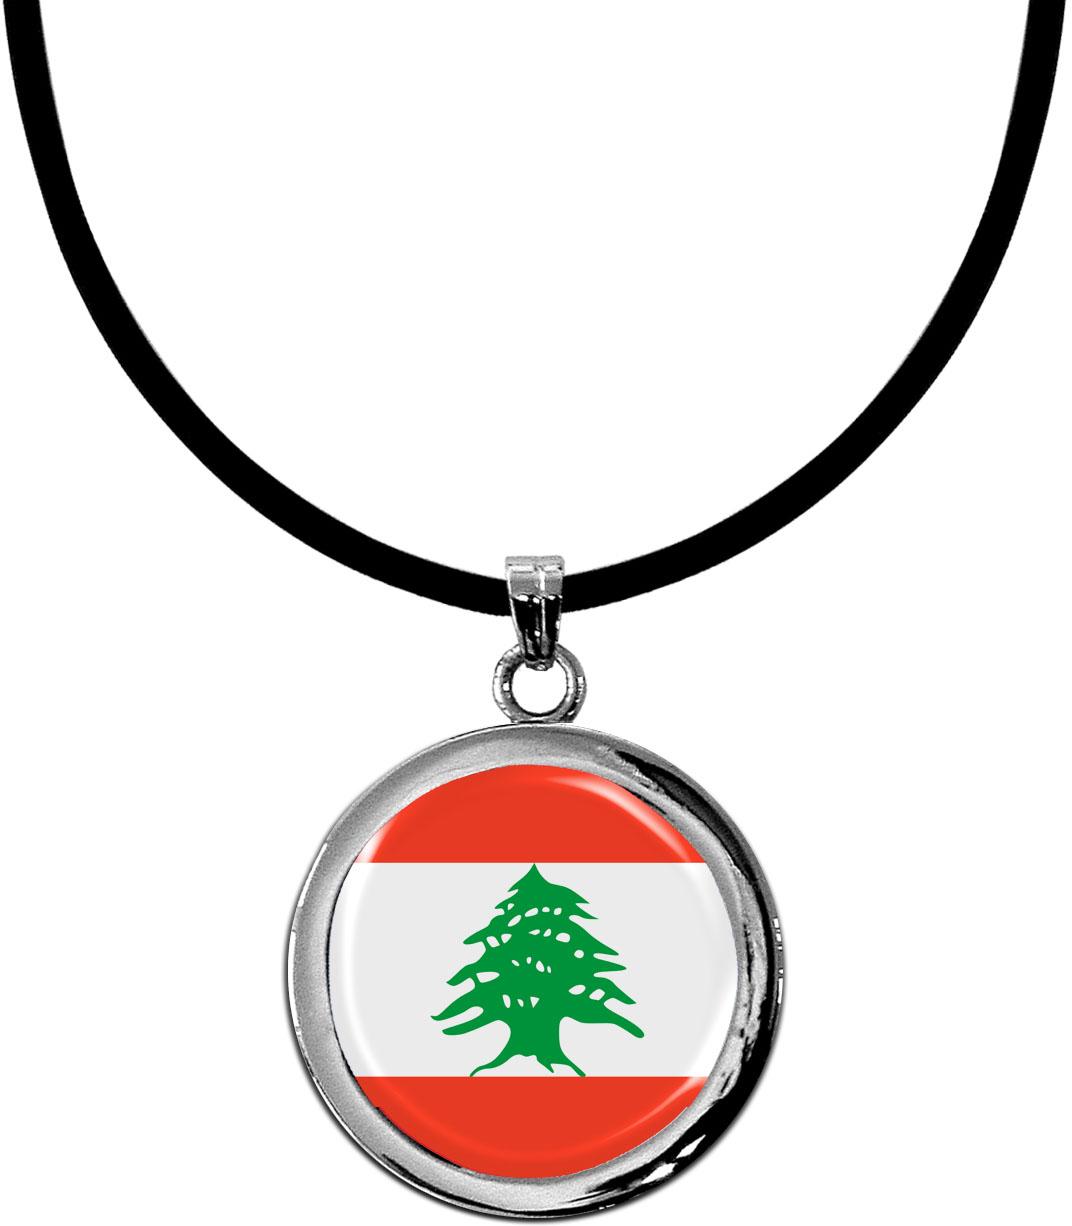 Kettenanhänger / Libanon / Silikonband mit Silberverschluss